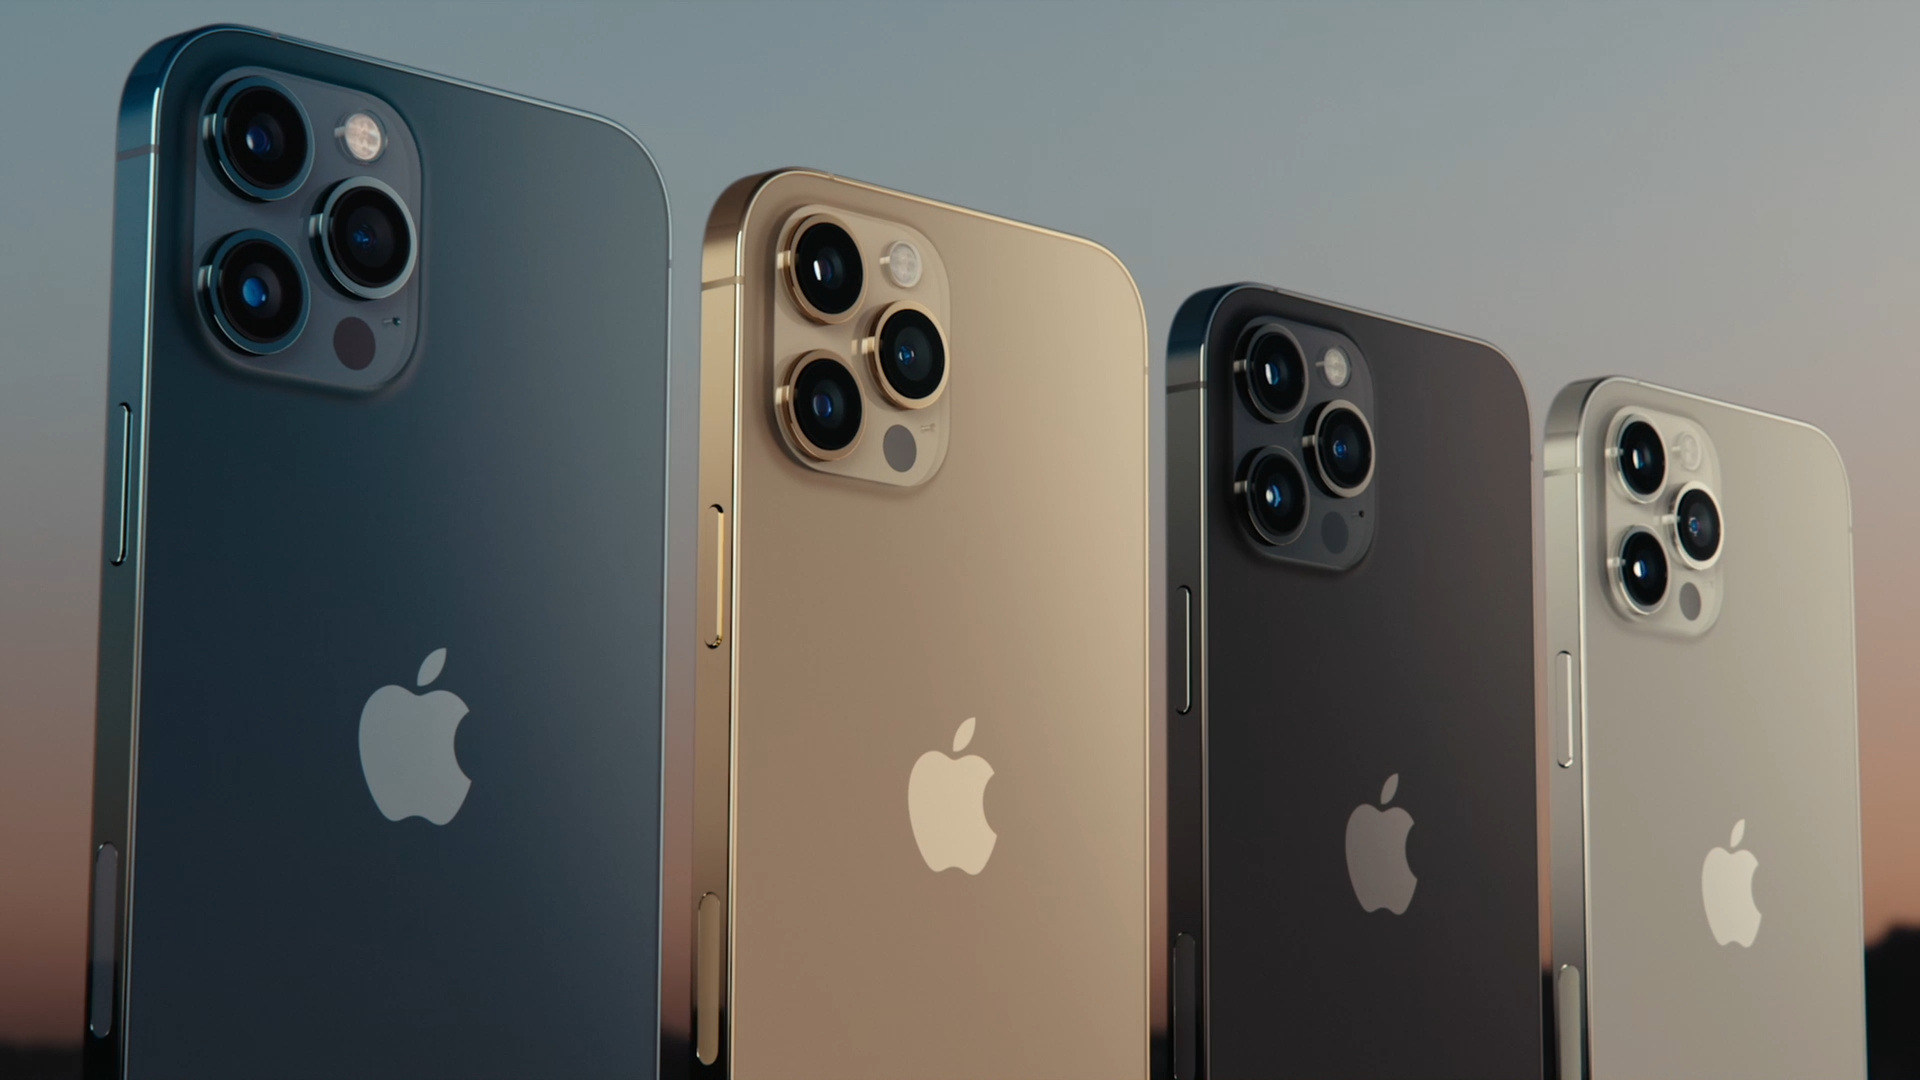 Smartphone, Apple, Iphone, iPhone 12, iPhone 12 Pro, iPhone 12 Pro Max, Apple iPhone 12 Pro Max, Apple iPhone 12 Pro